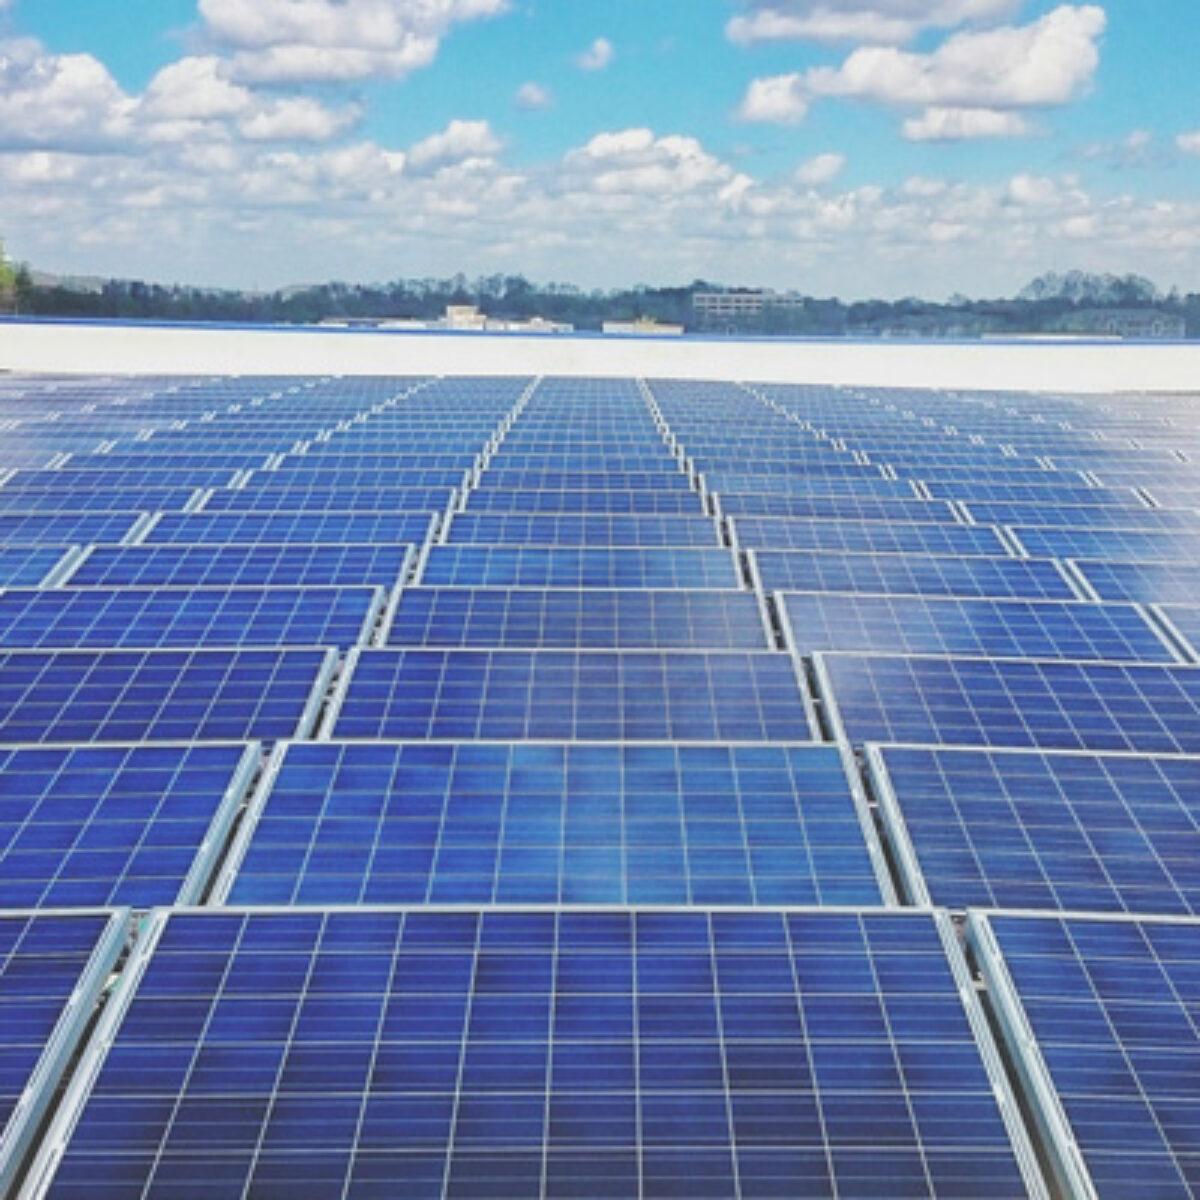 community-power-solar-panels-nyc-400